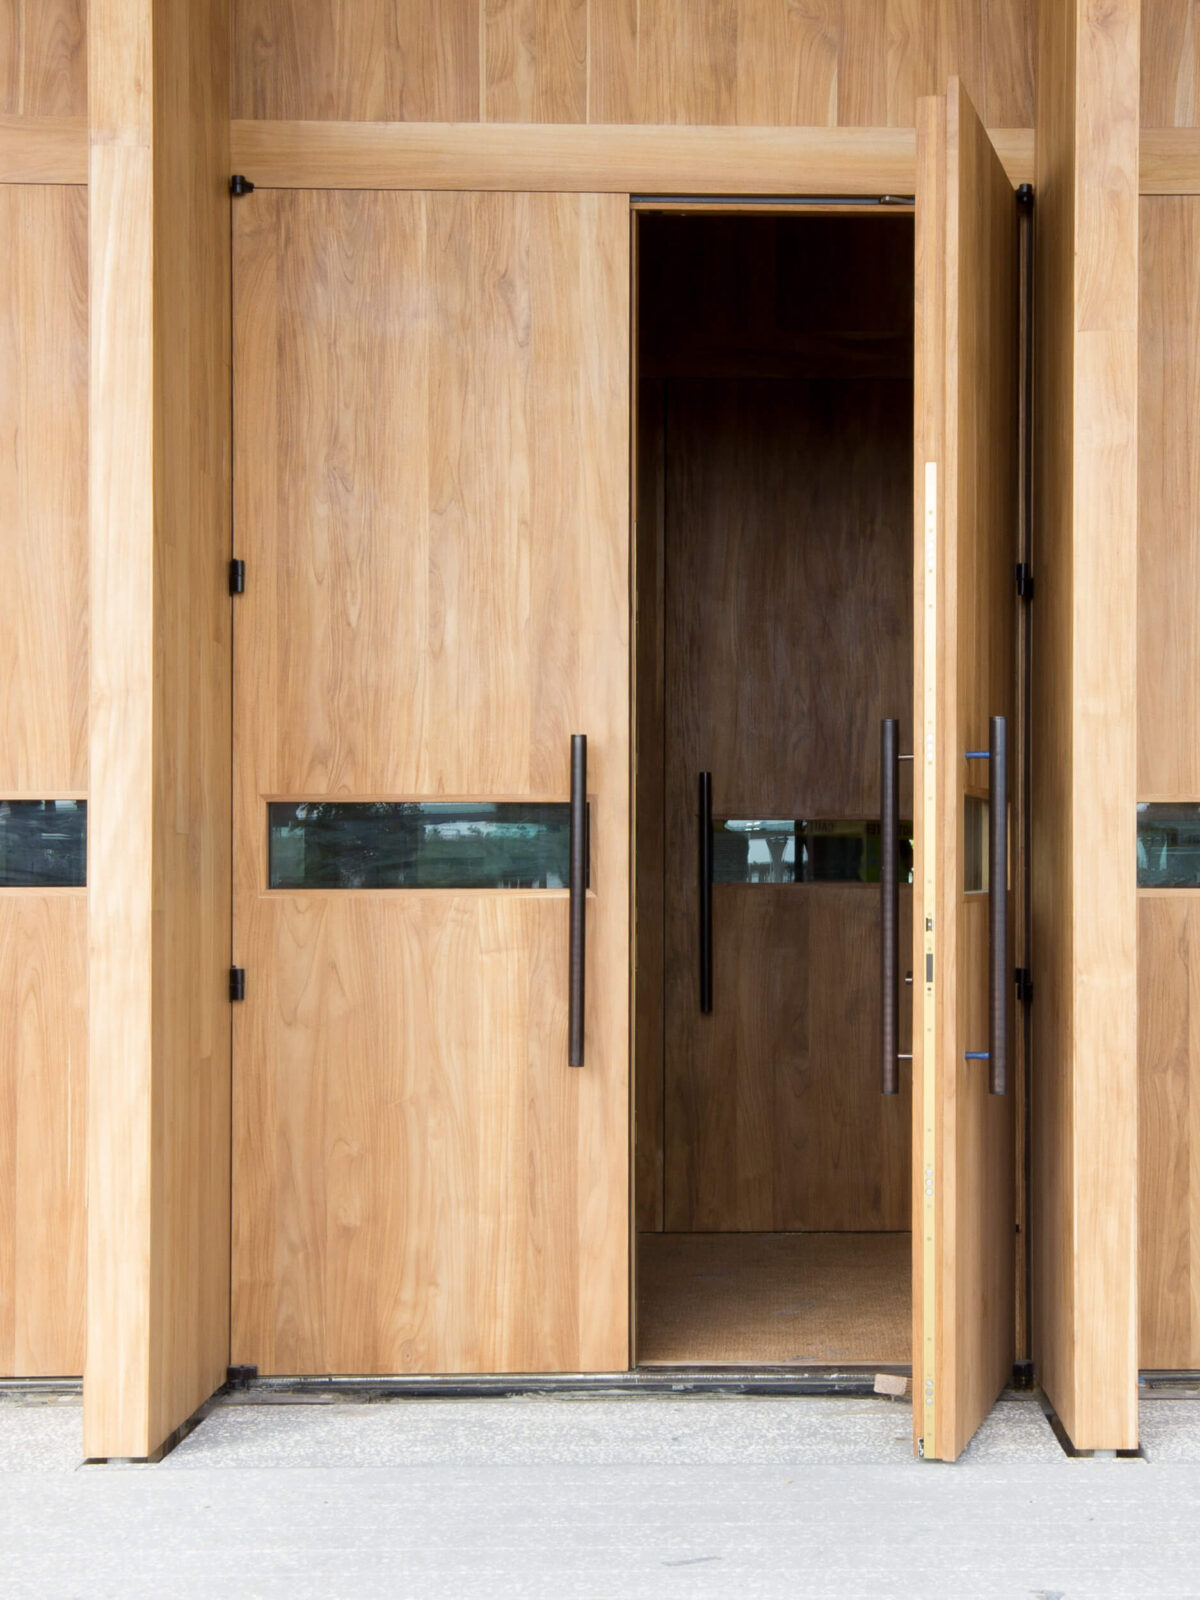 TEAK ENTRANCE DOORS FOR THE MIAMI PEREZ ART MUSEUM.